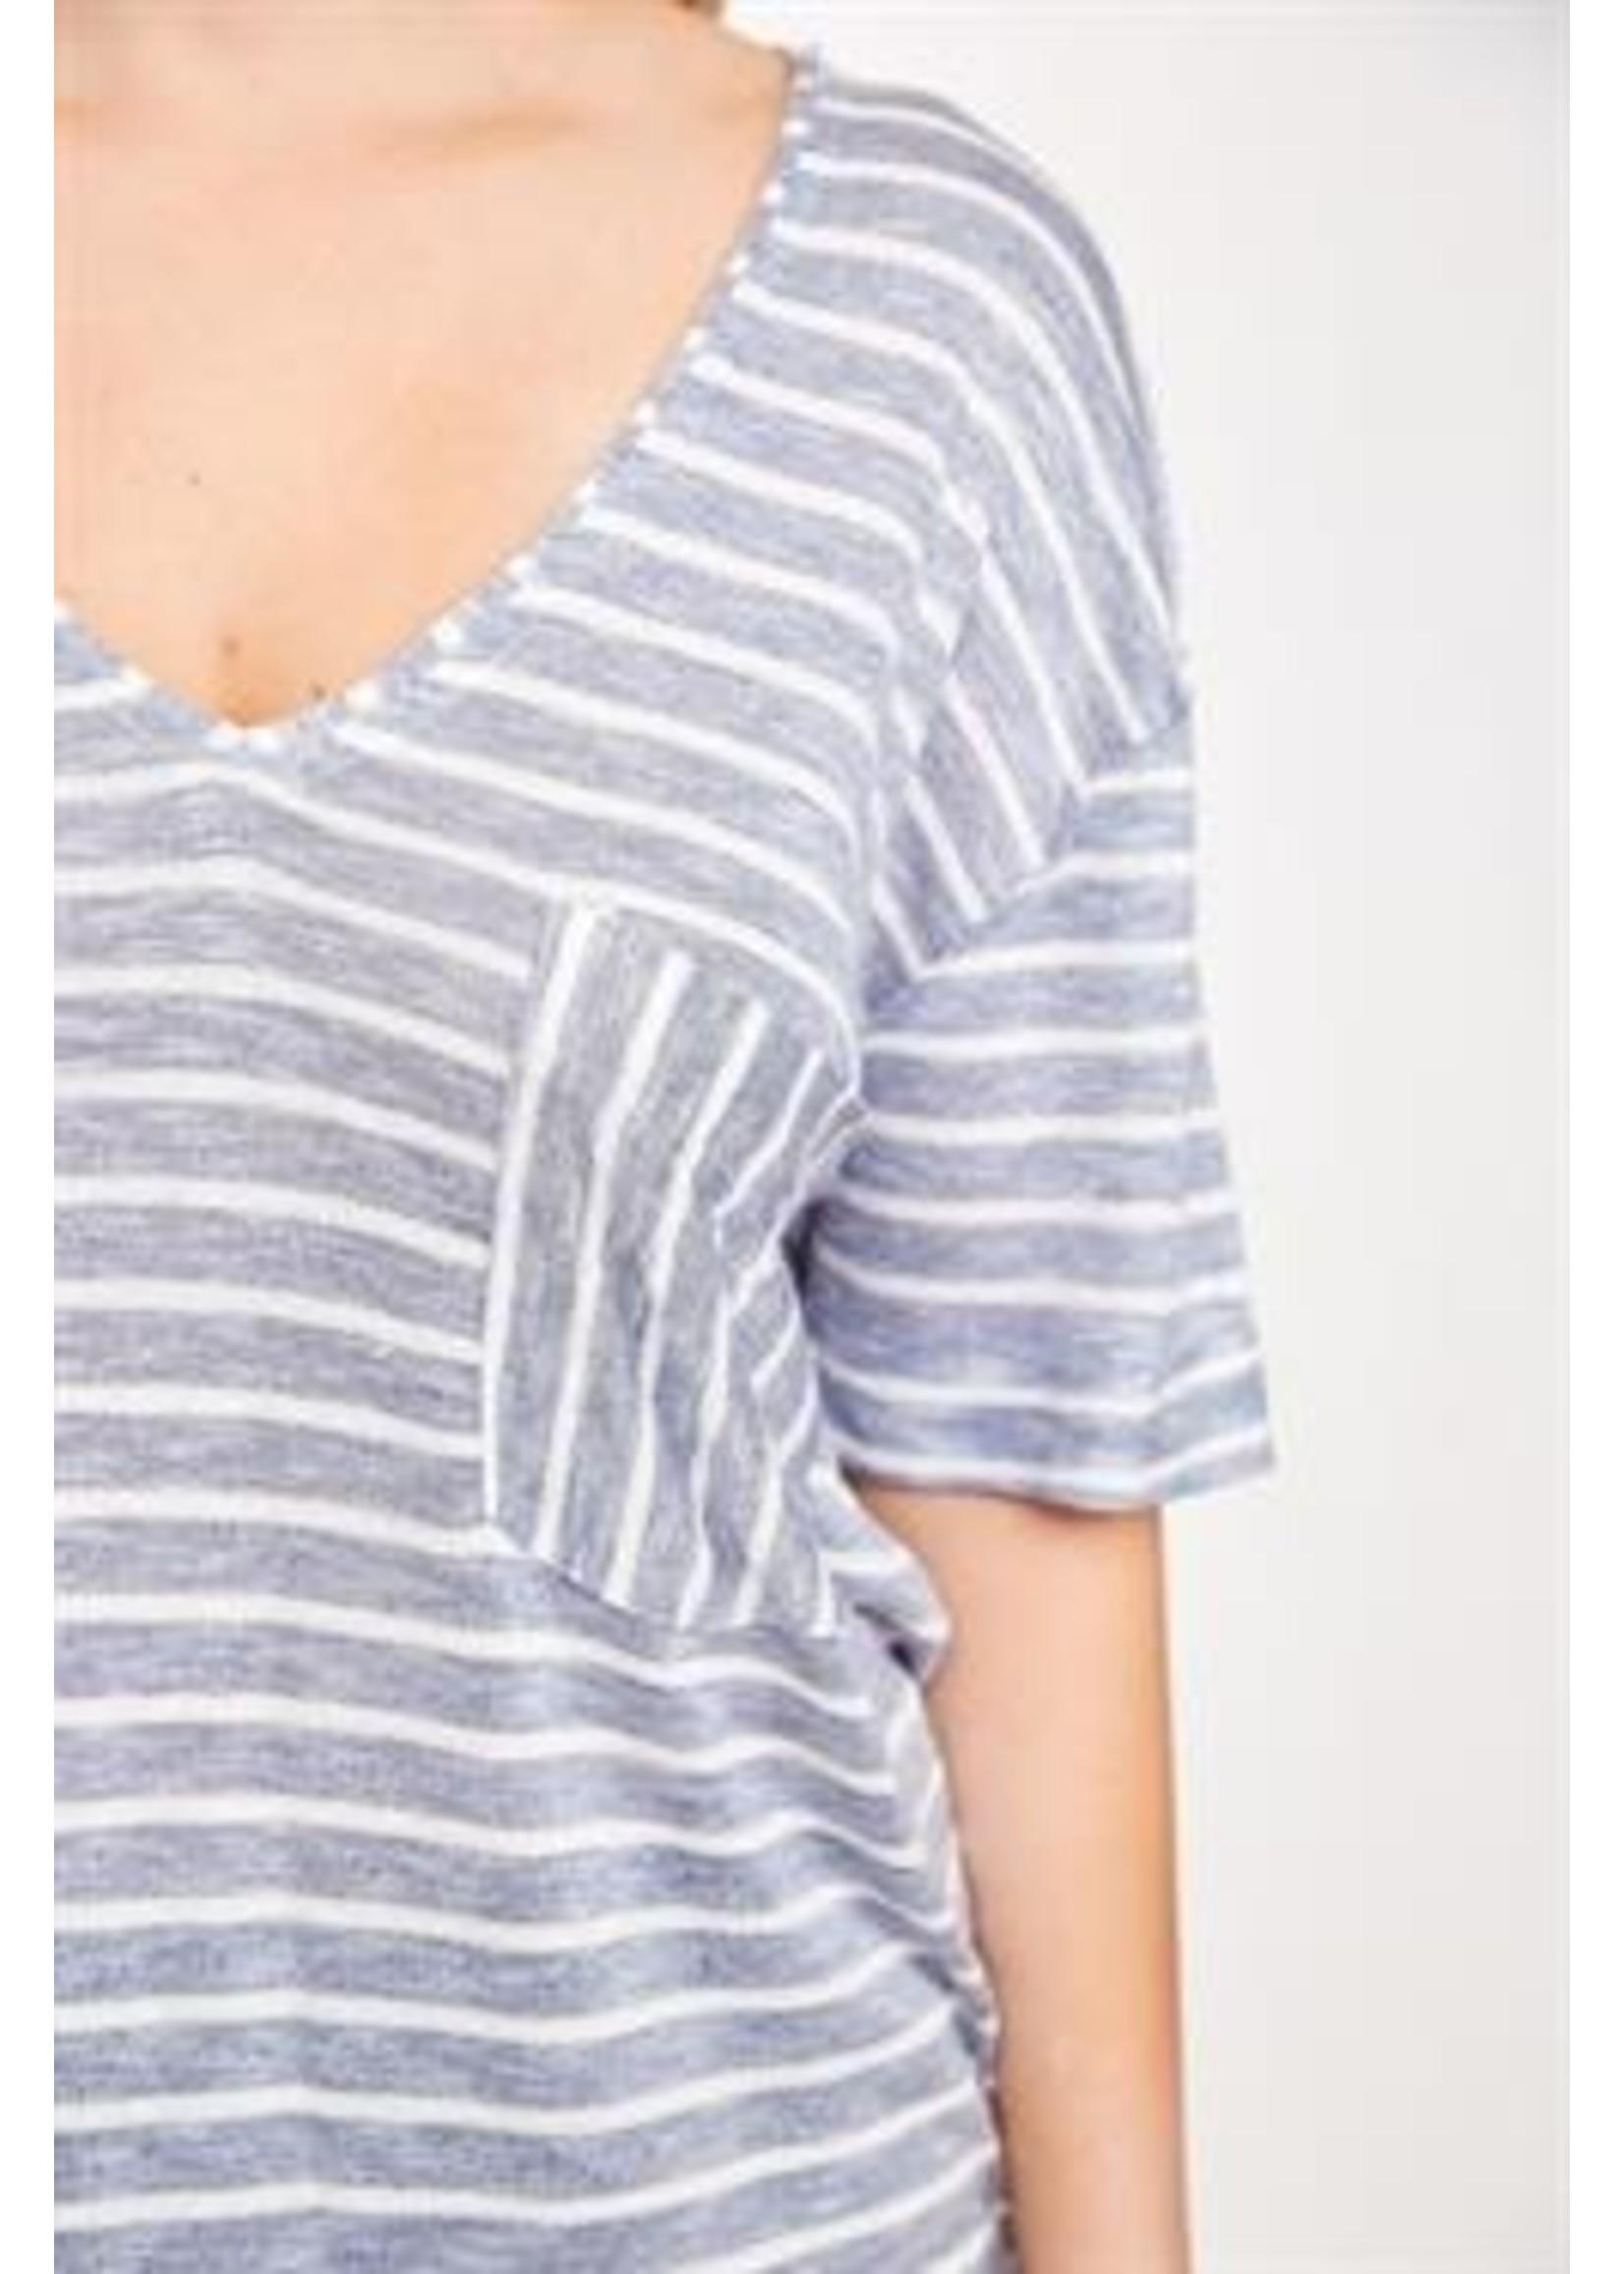 L Love Striped Pocket Tunic